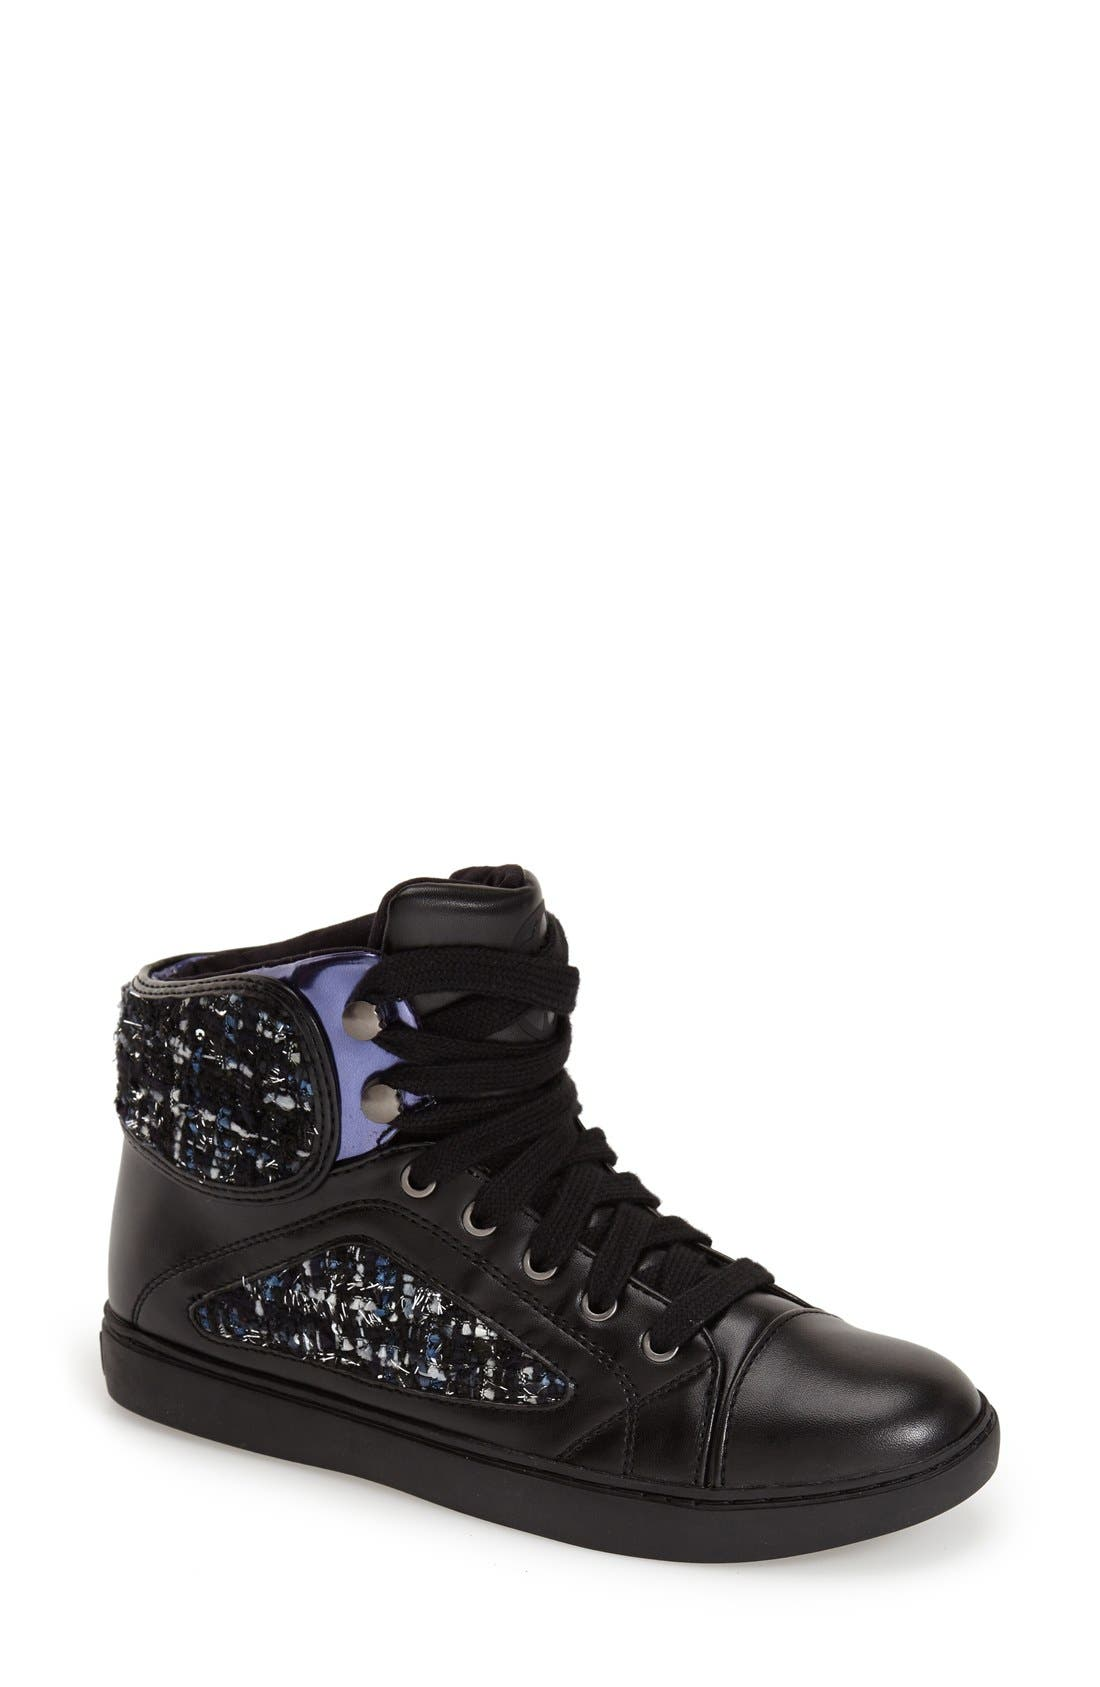 Main Image - GUESS 'Revera' Sneaker (Women)